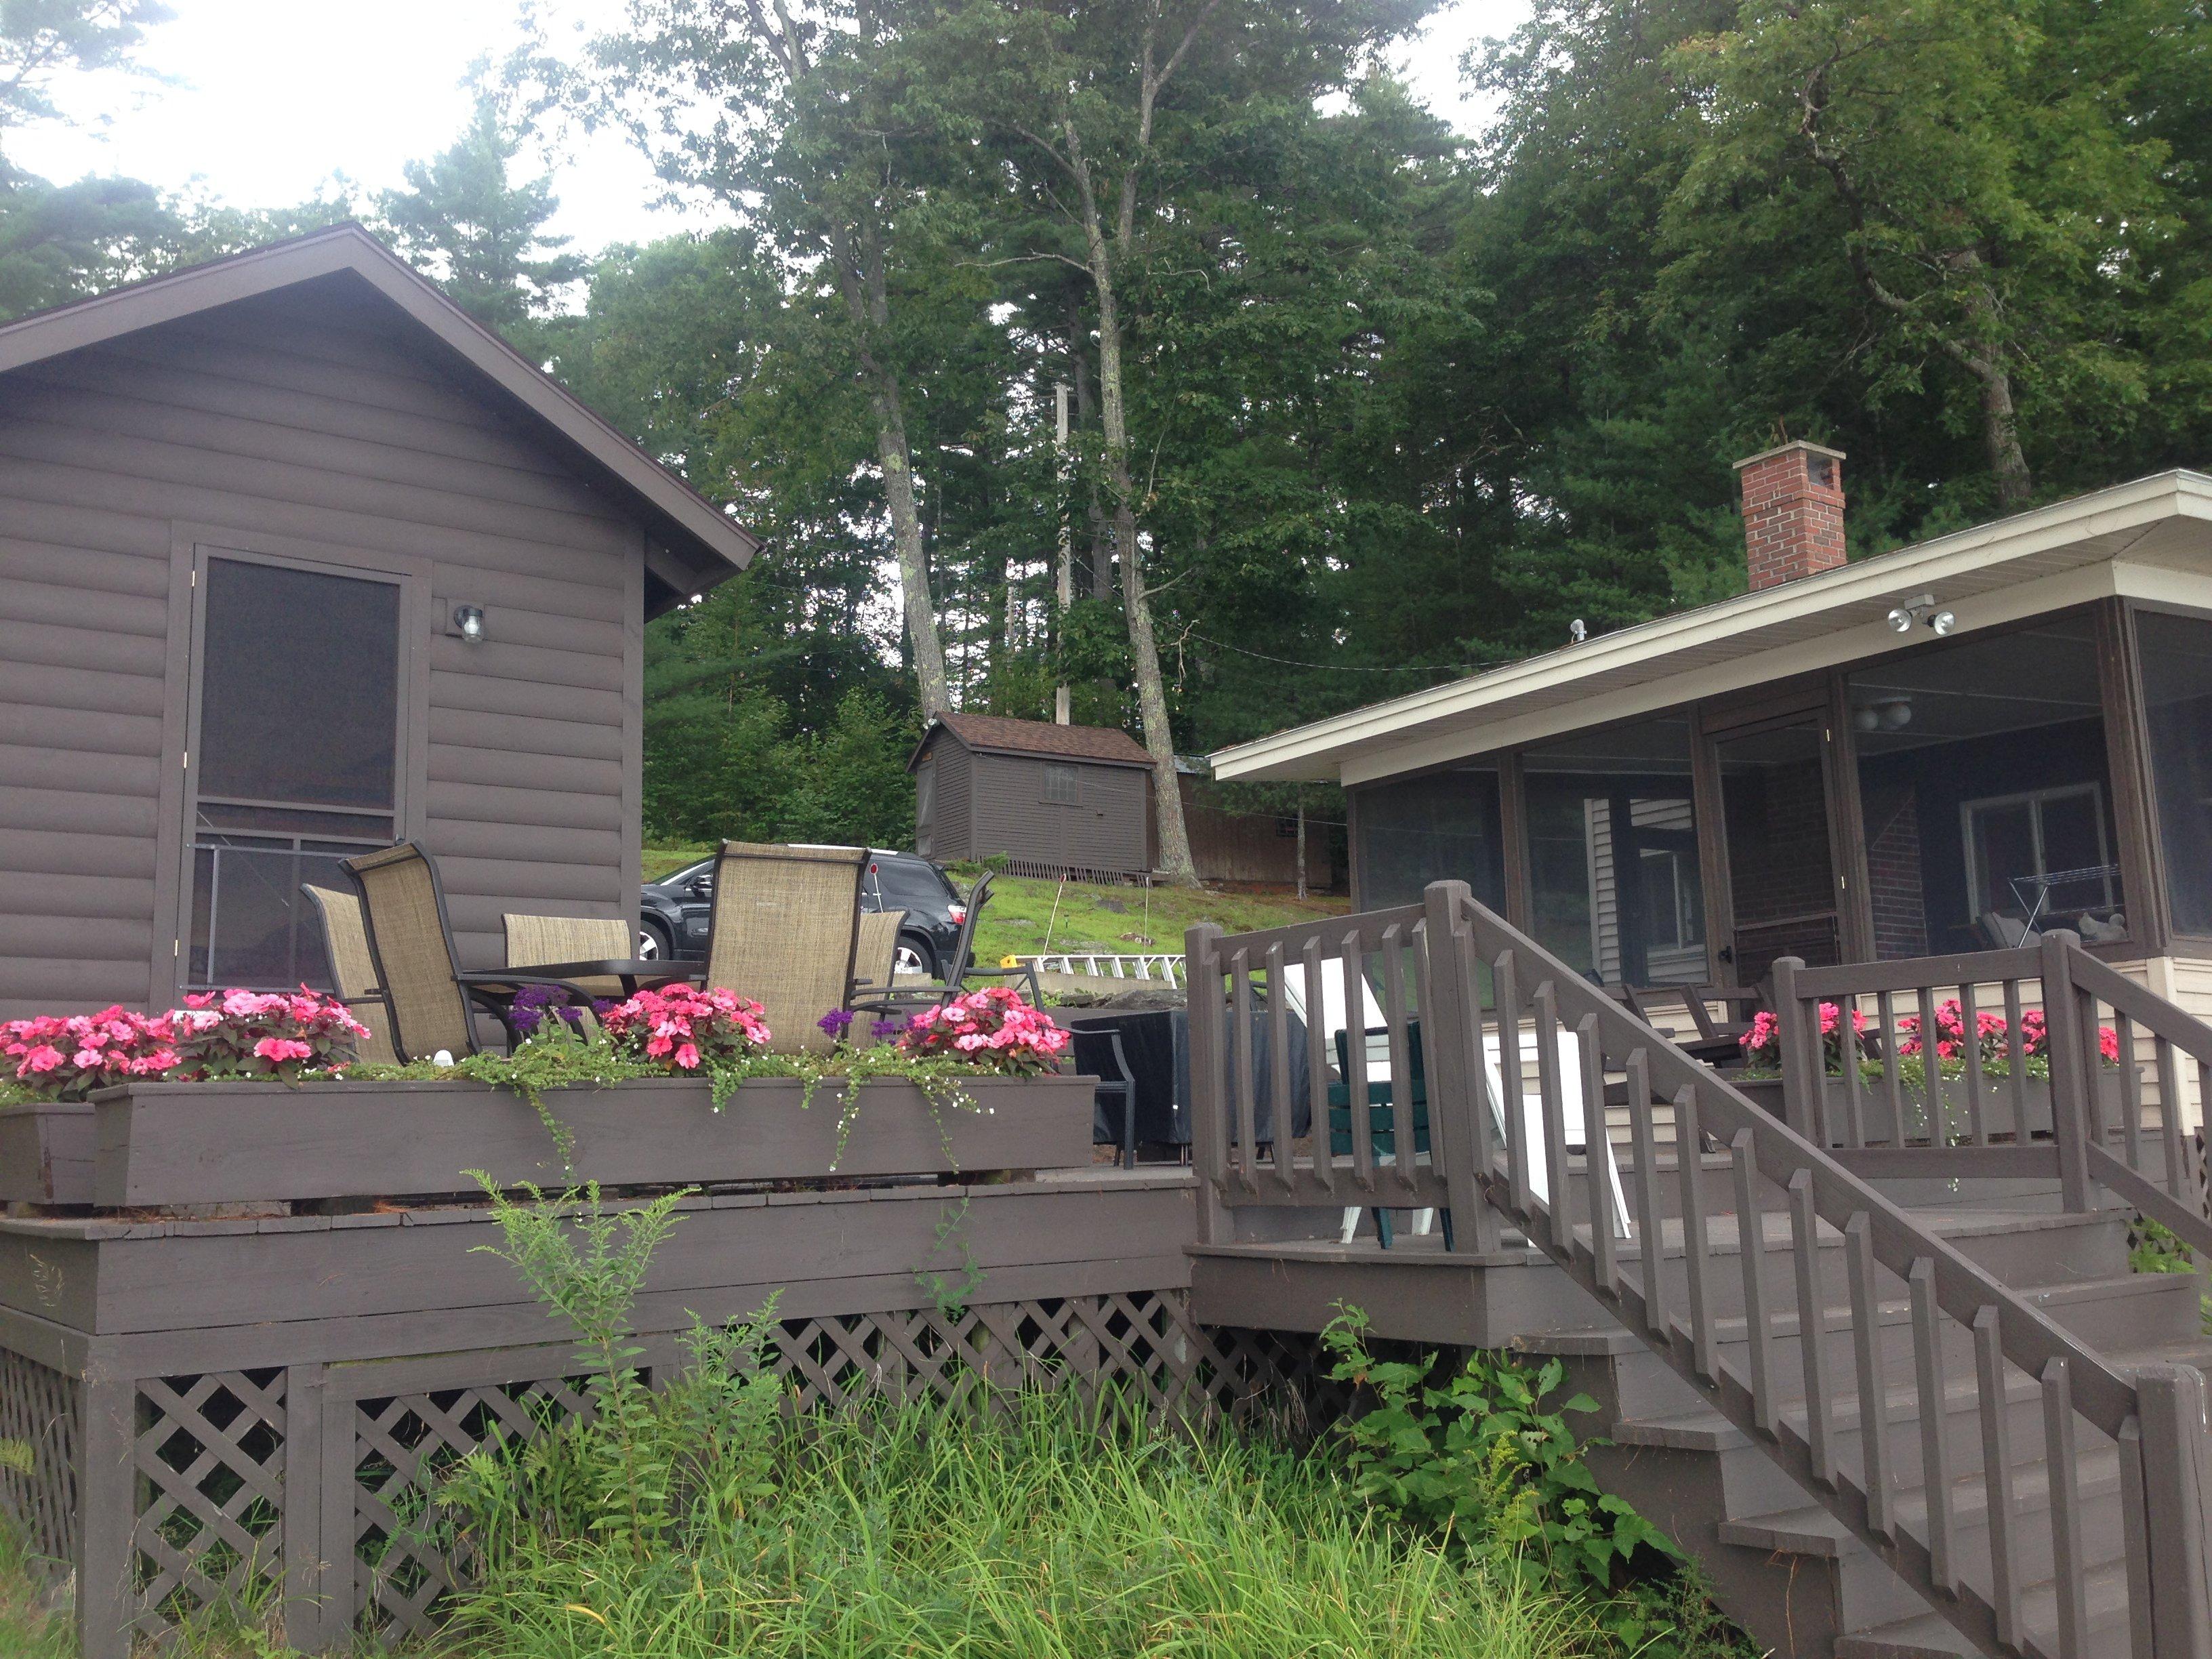 Cozy bunk house sleeps three, camp sleeps 4, so 7 total on Cobbosseecontee lake